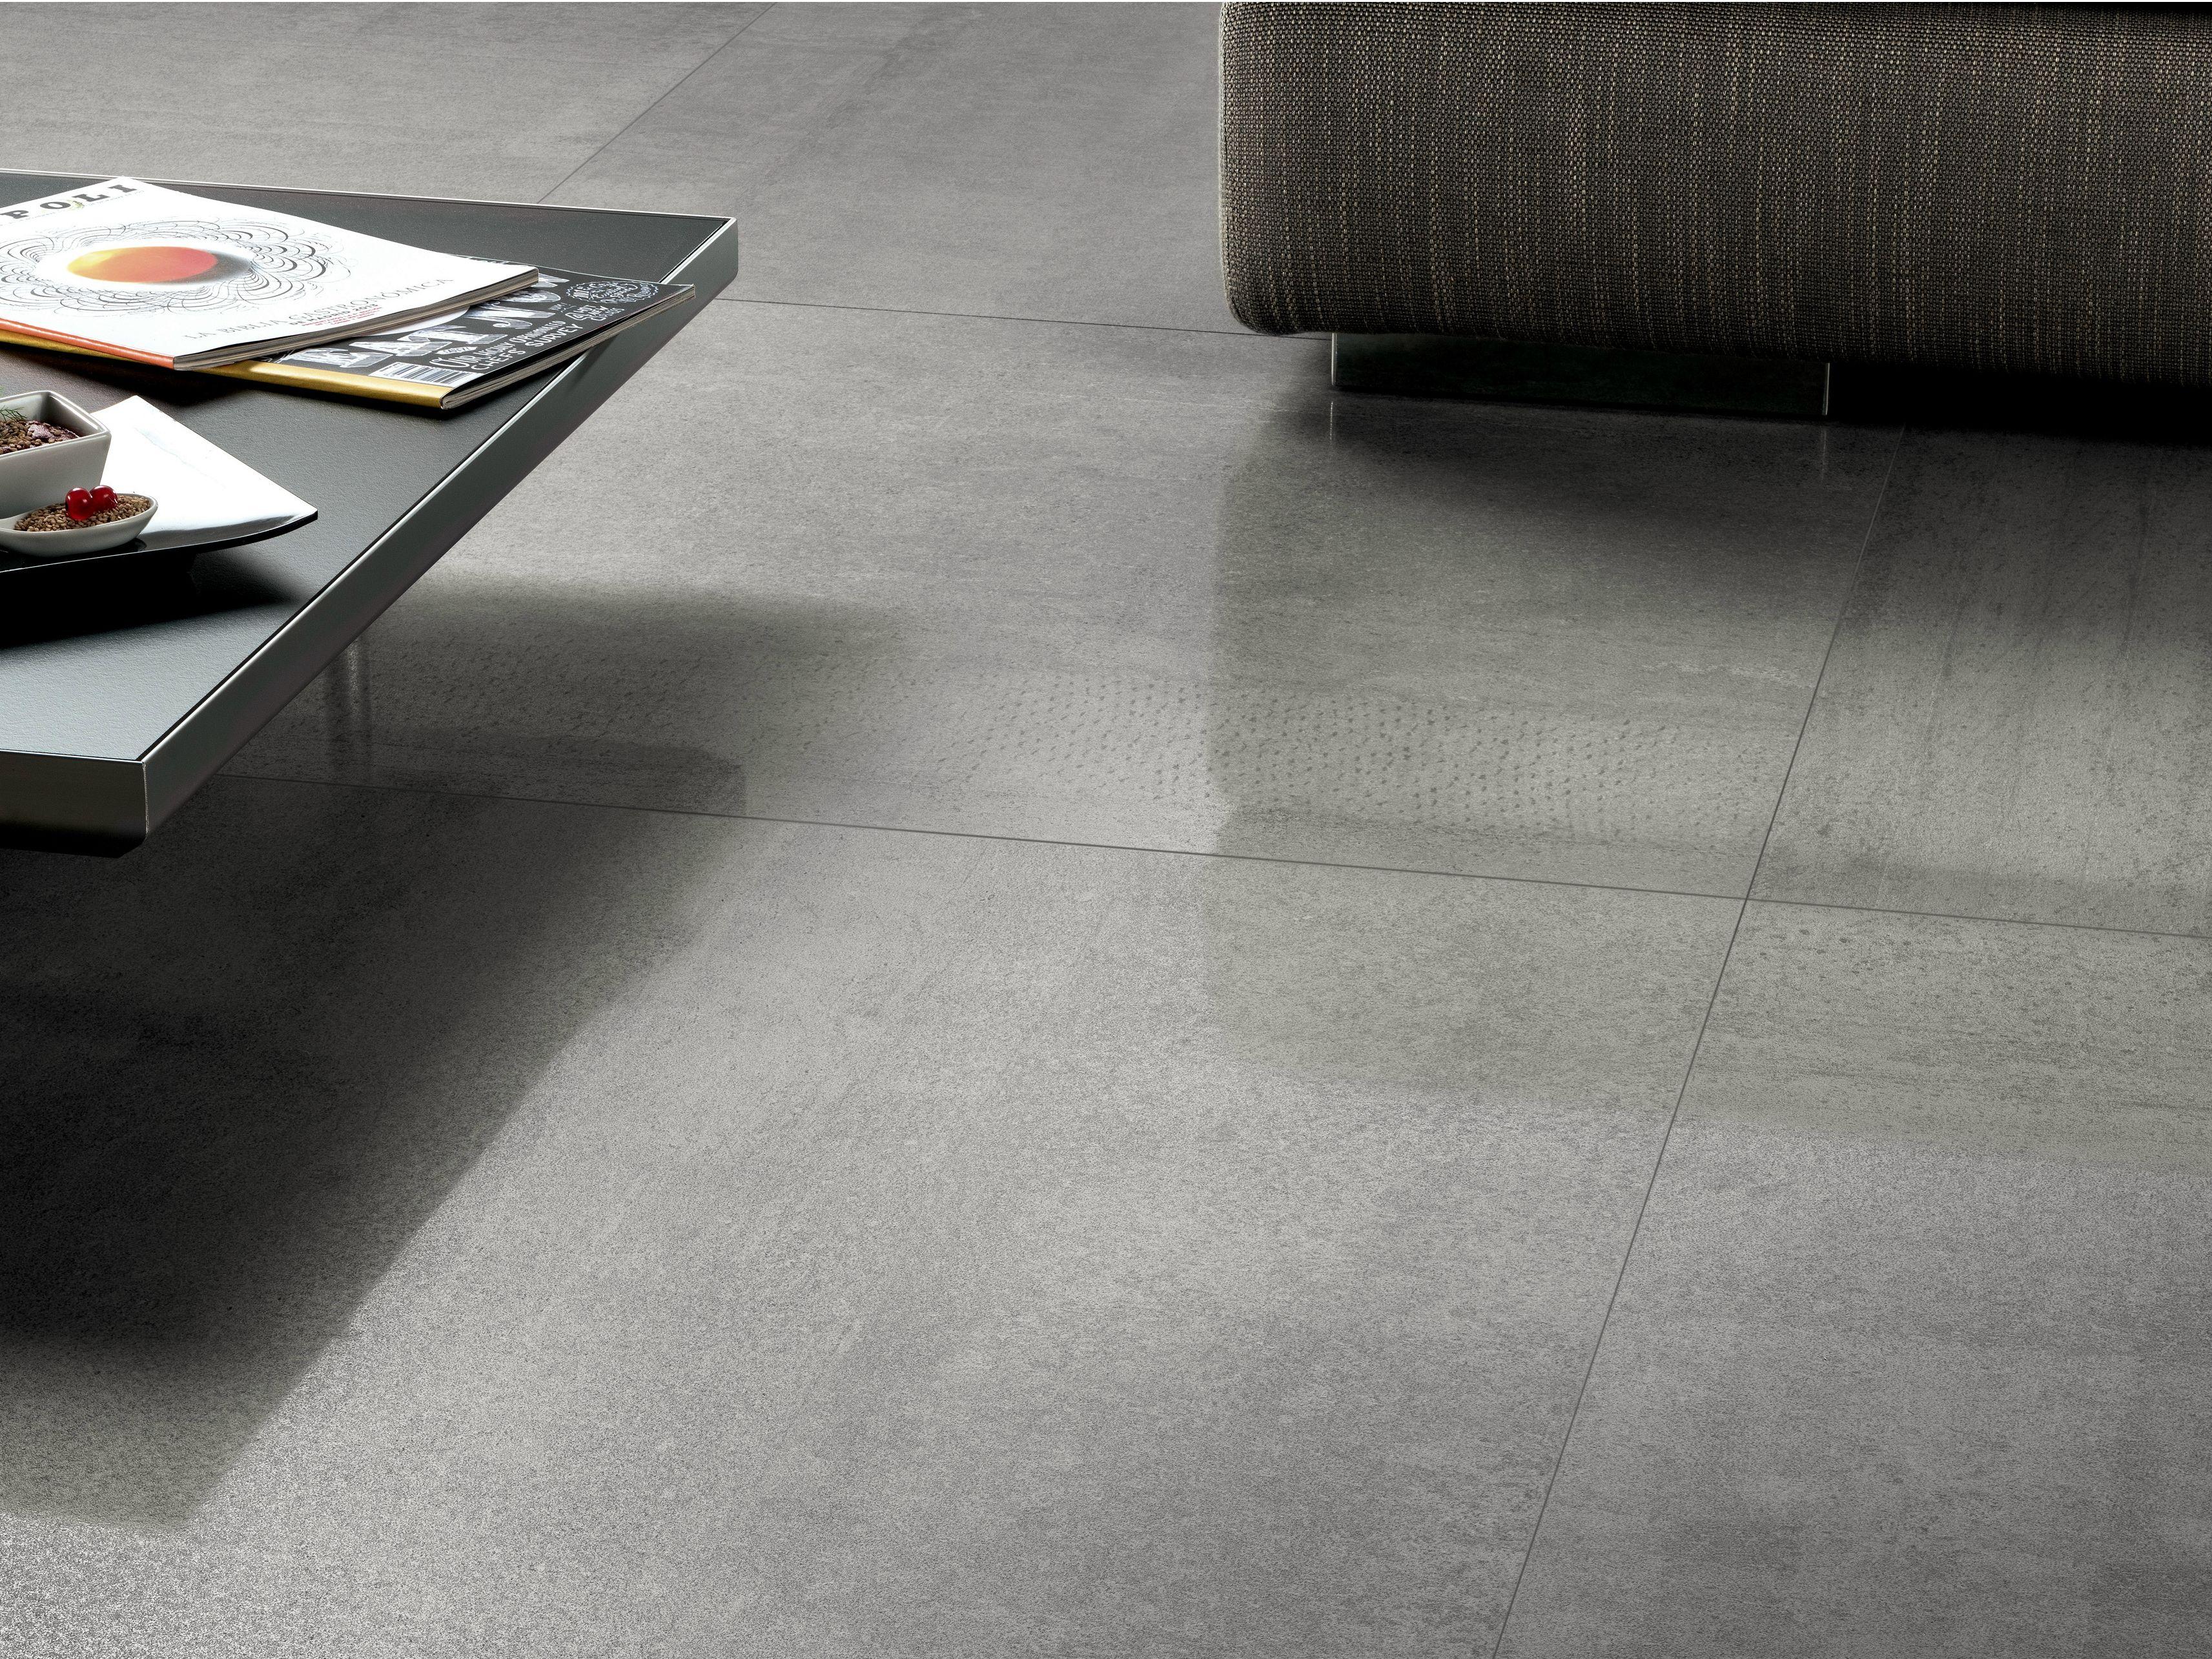 Gres grigio scuro elegant marazzi sistemp project mosaico grigio